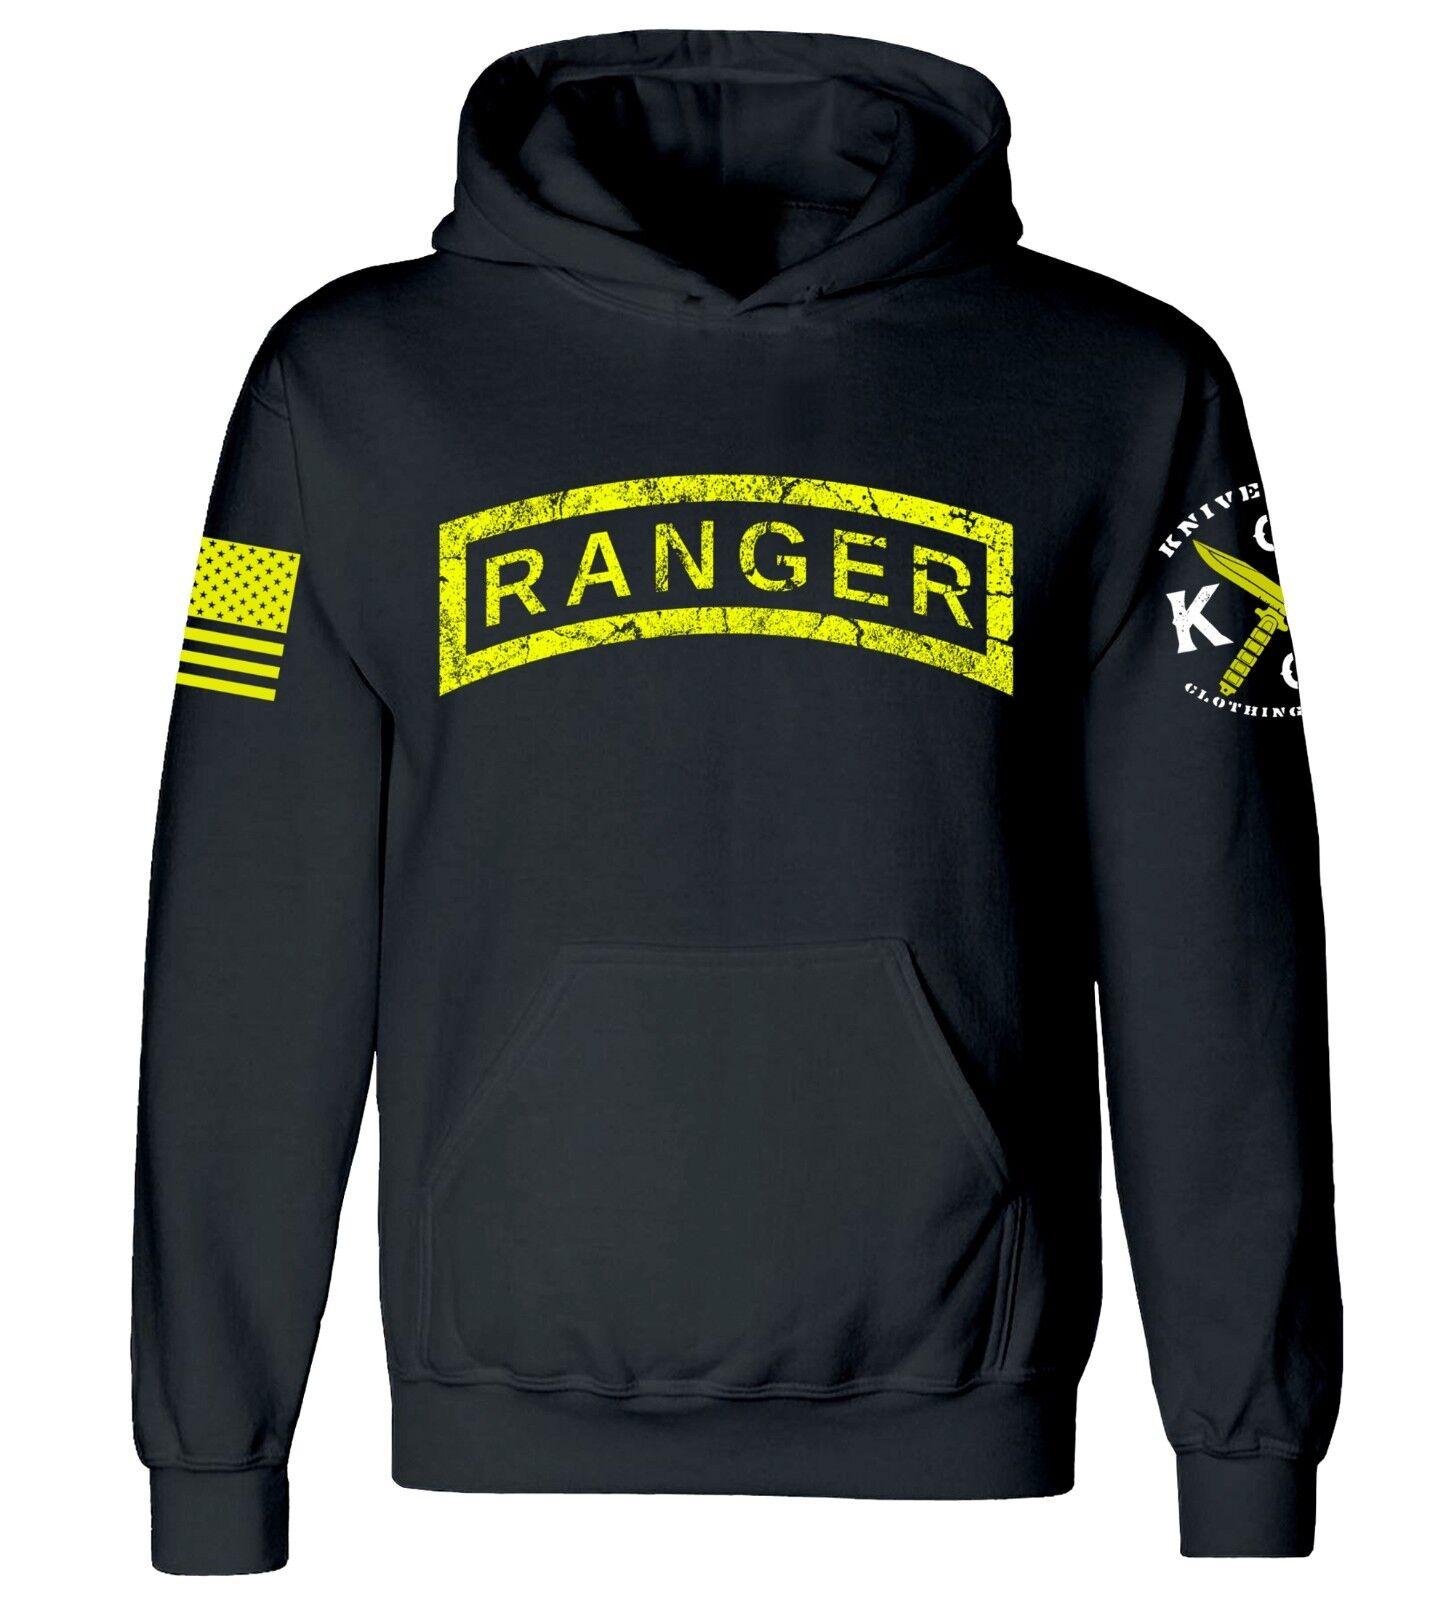 Distressed Ranger Tab Hooded Sweatshirt I US Army Ranger I Veteran I Military